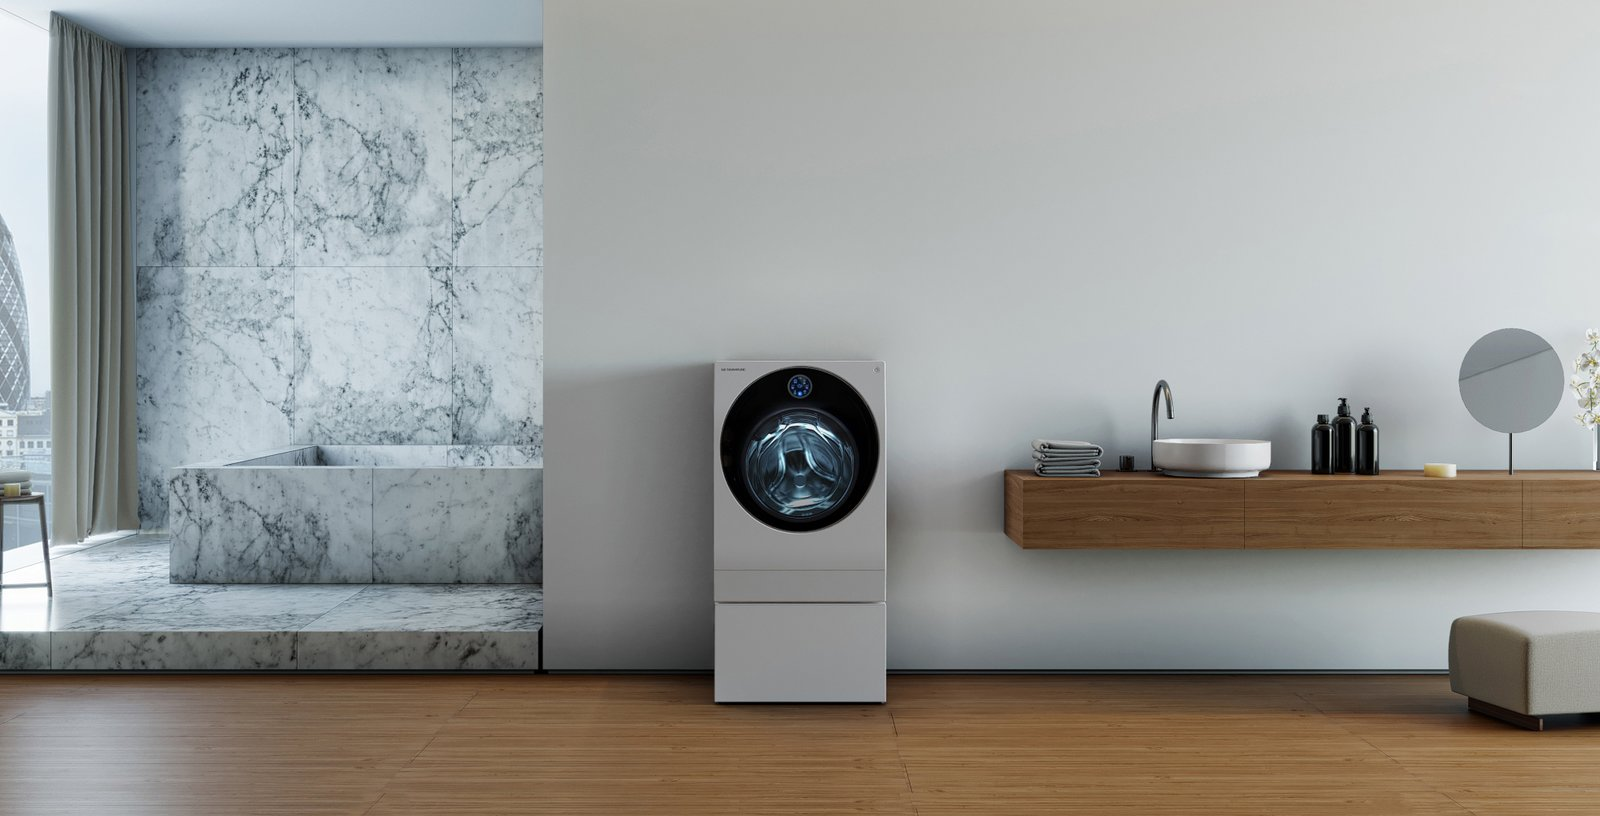 LG Signature smart home appliance laundry